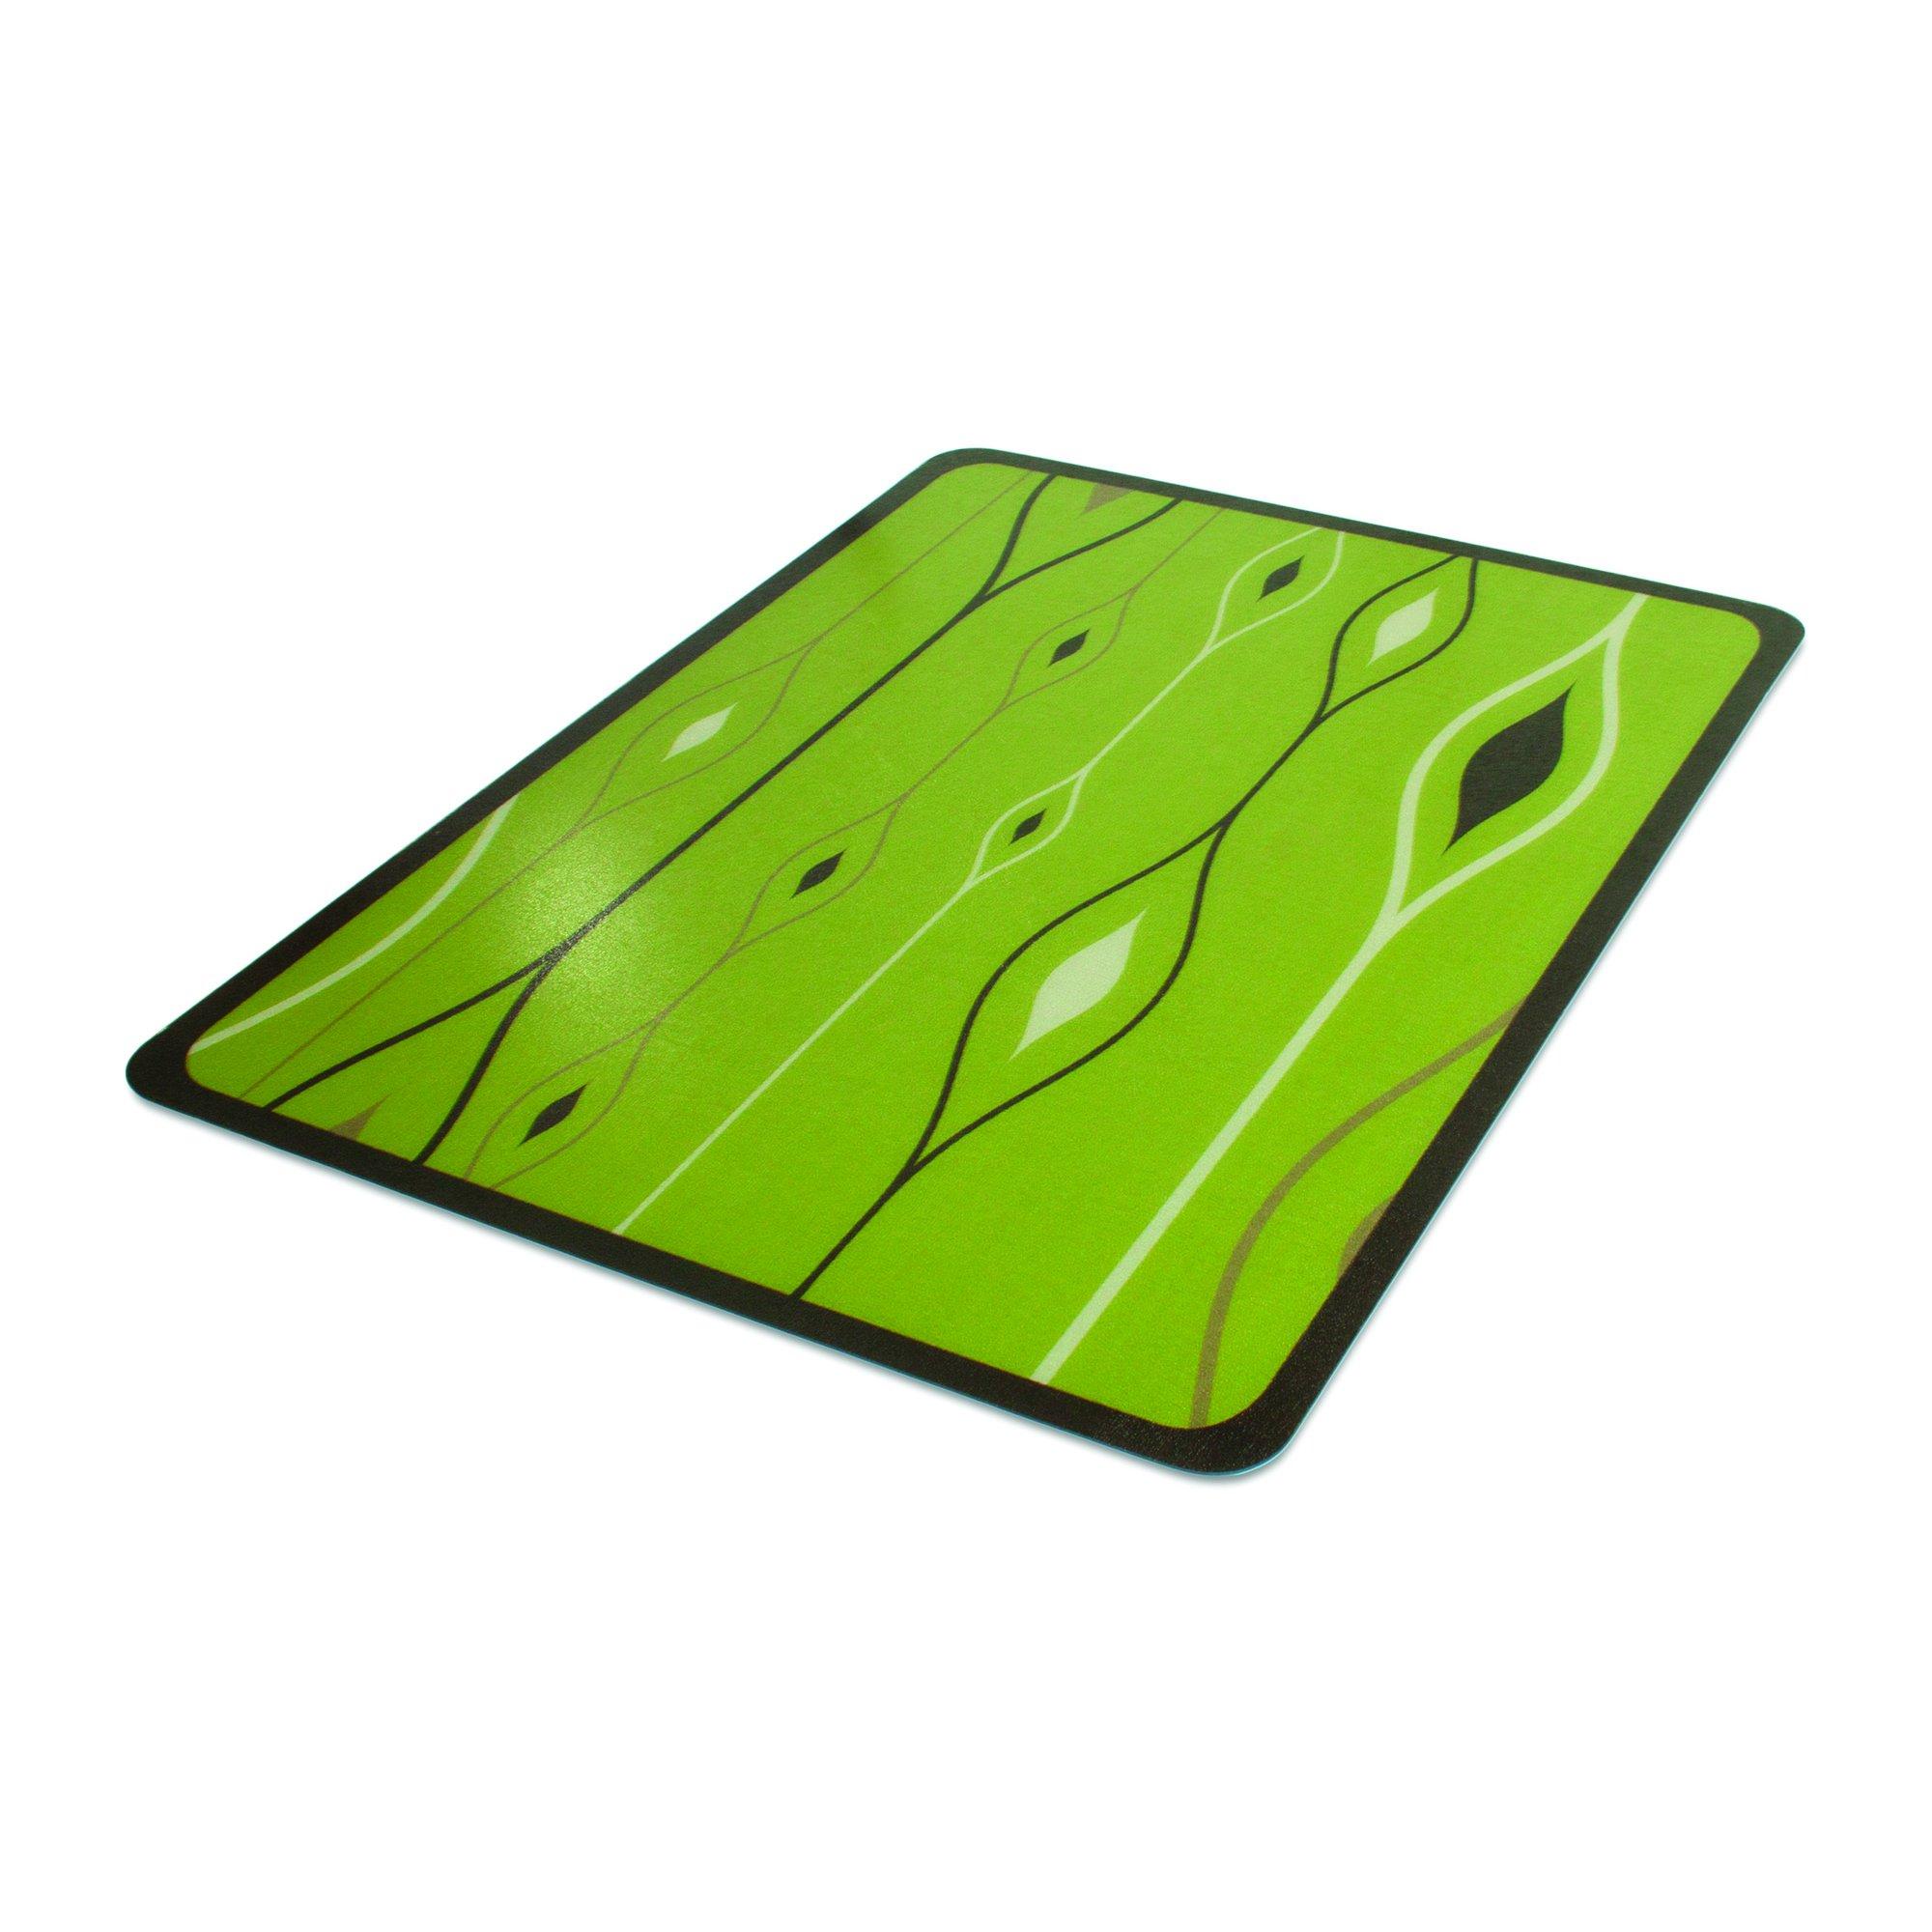 Deflecto DuraMat Decorative Chair Mat, Hard Floor Use, Rectangle, Straight Edge, 45 x 53 Inches, Wave Olivine Print (CM23242NWO)